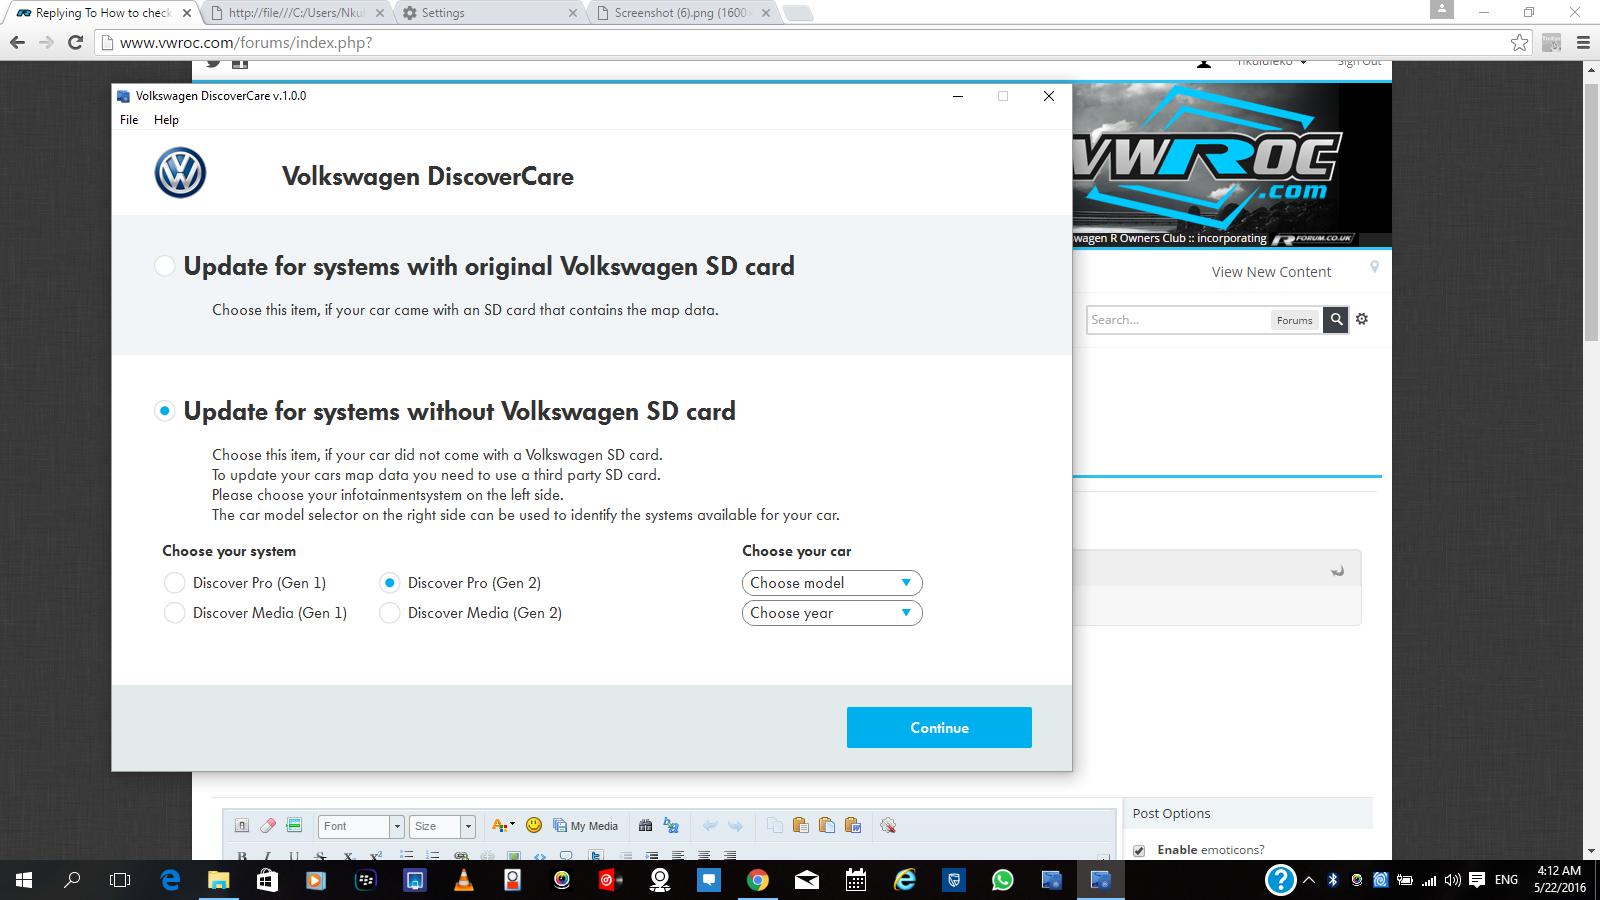 Sat nav update help needed please  - VW Golf R MK7 Chat - VWROC - VW